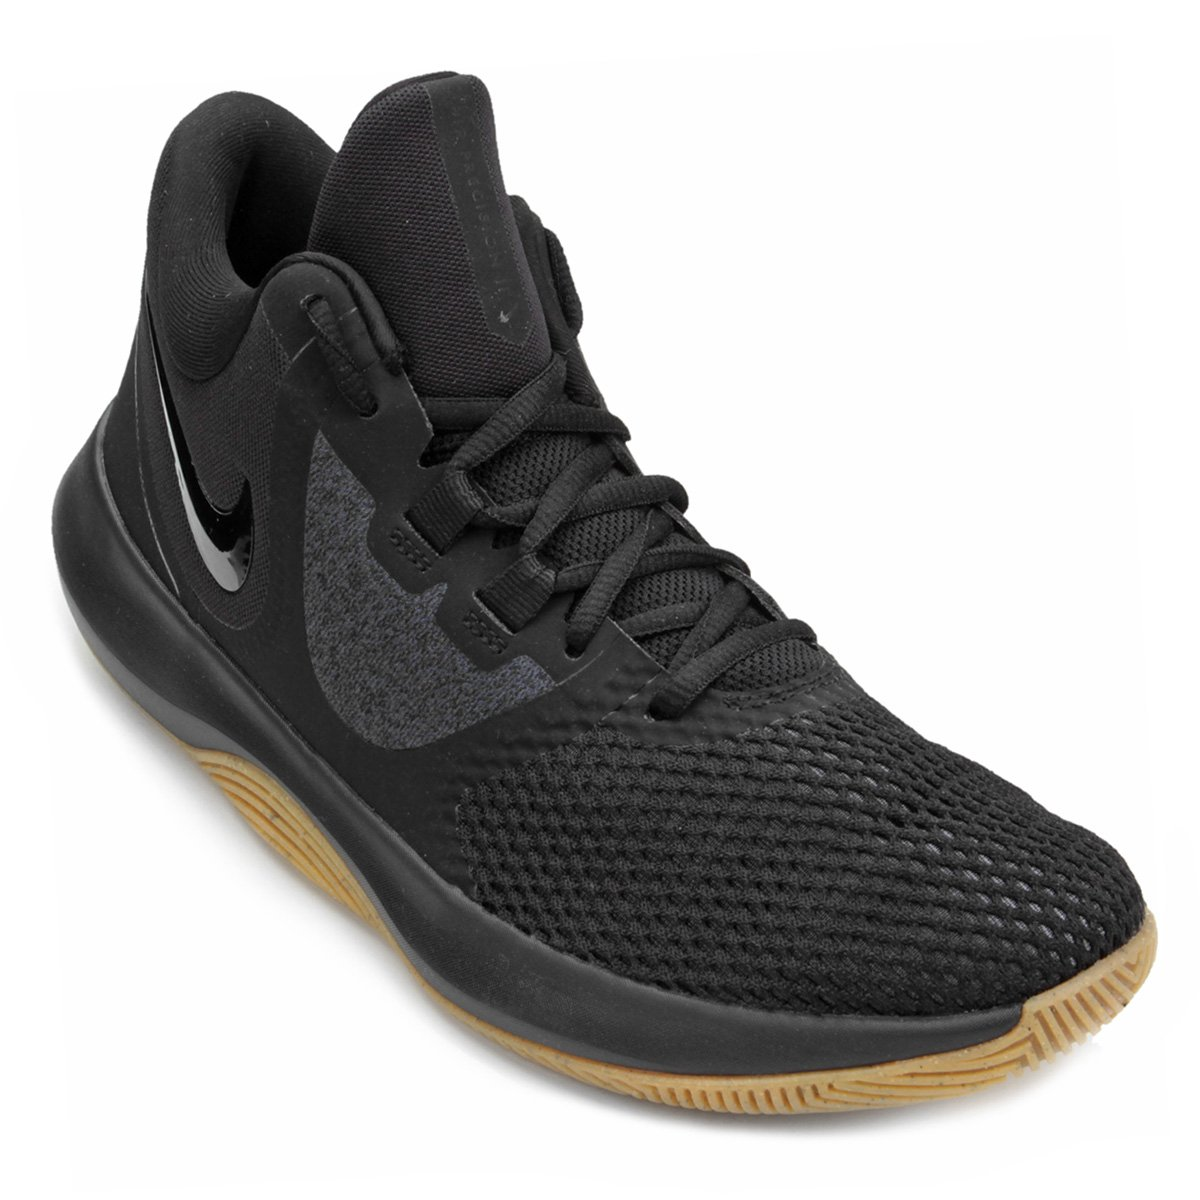 208db7500 Tênis Nike Air Precision II Masculino - Preto e Bege - Compre Agora ...